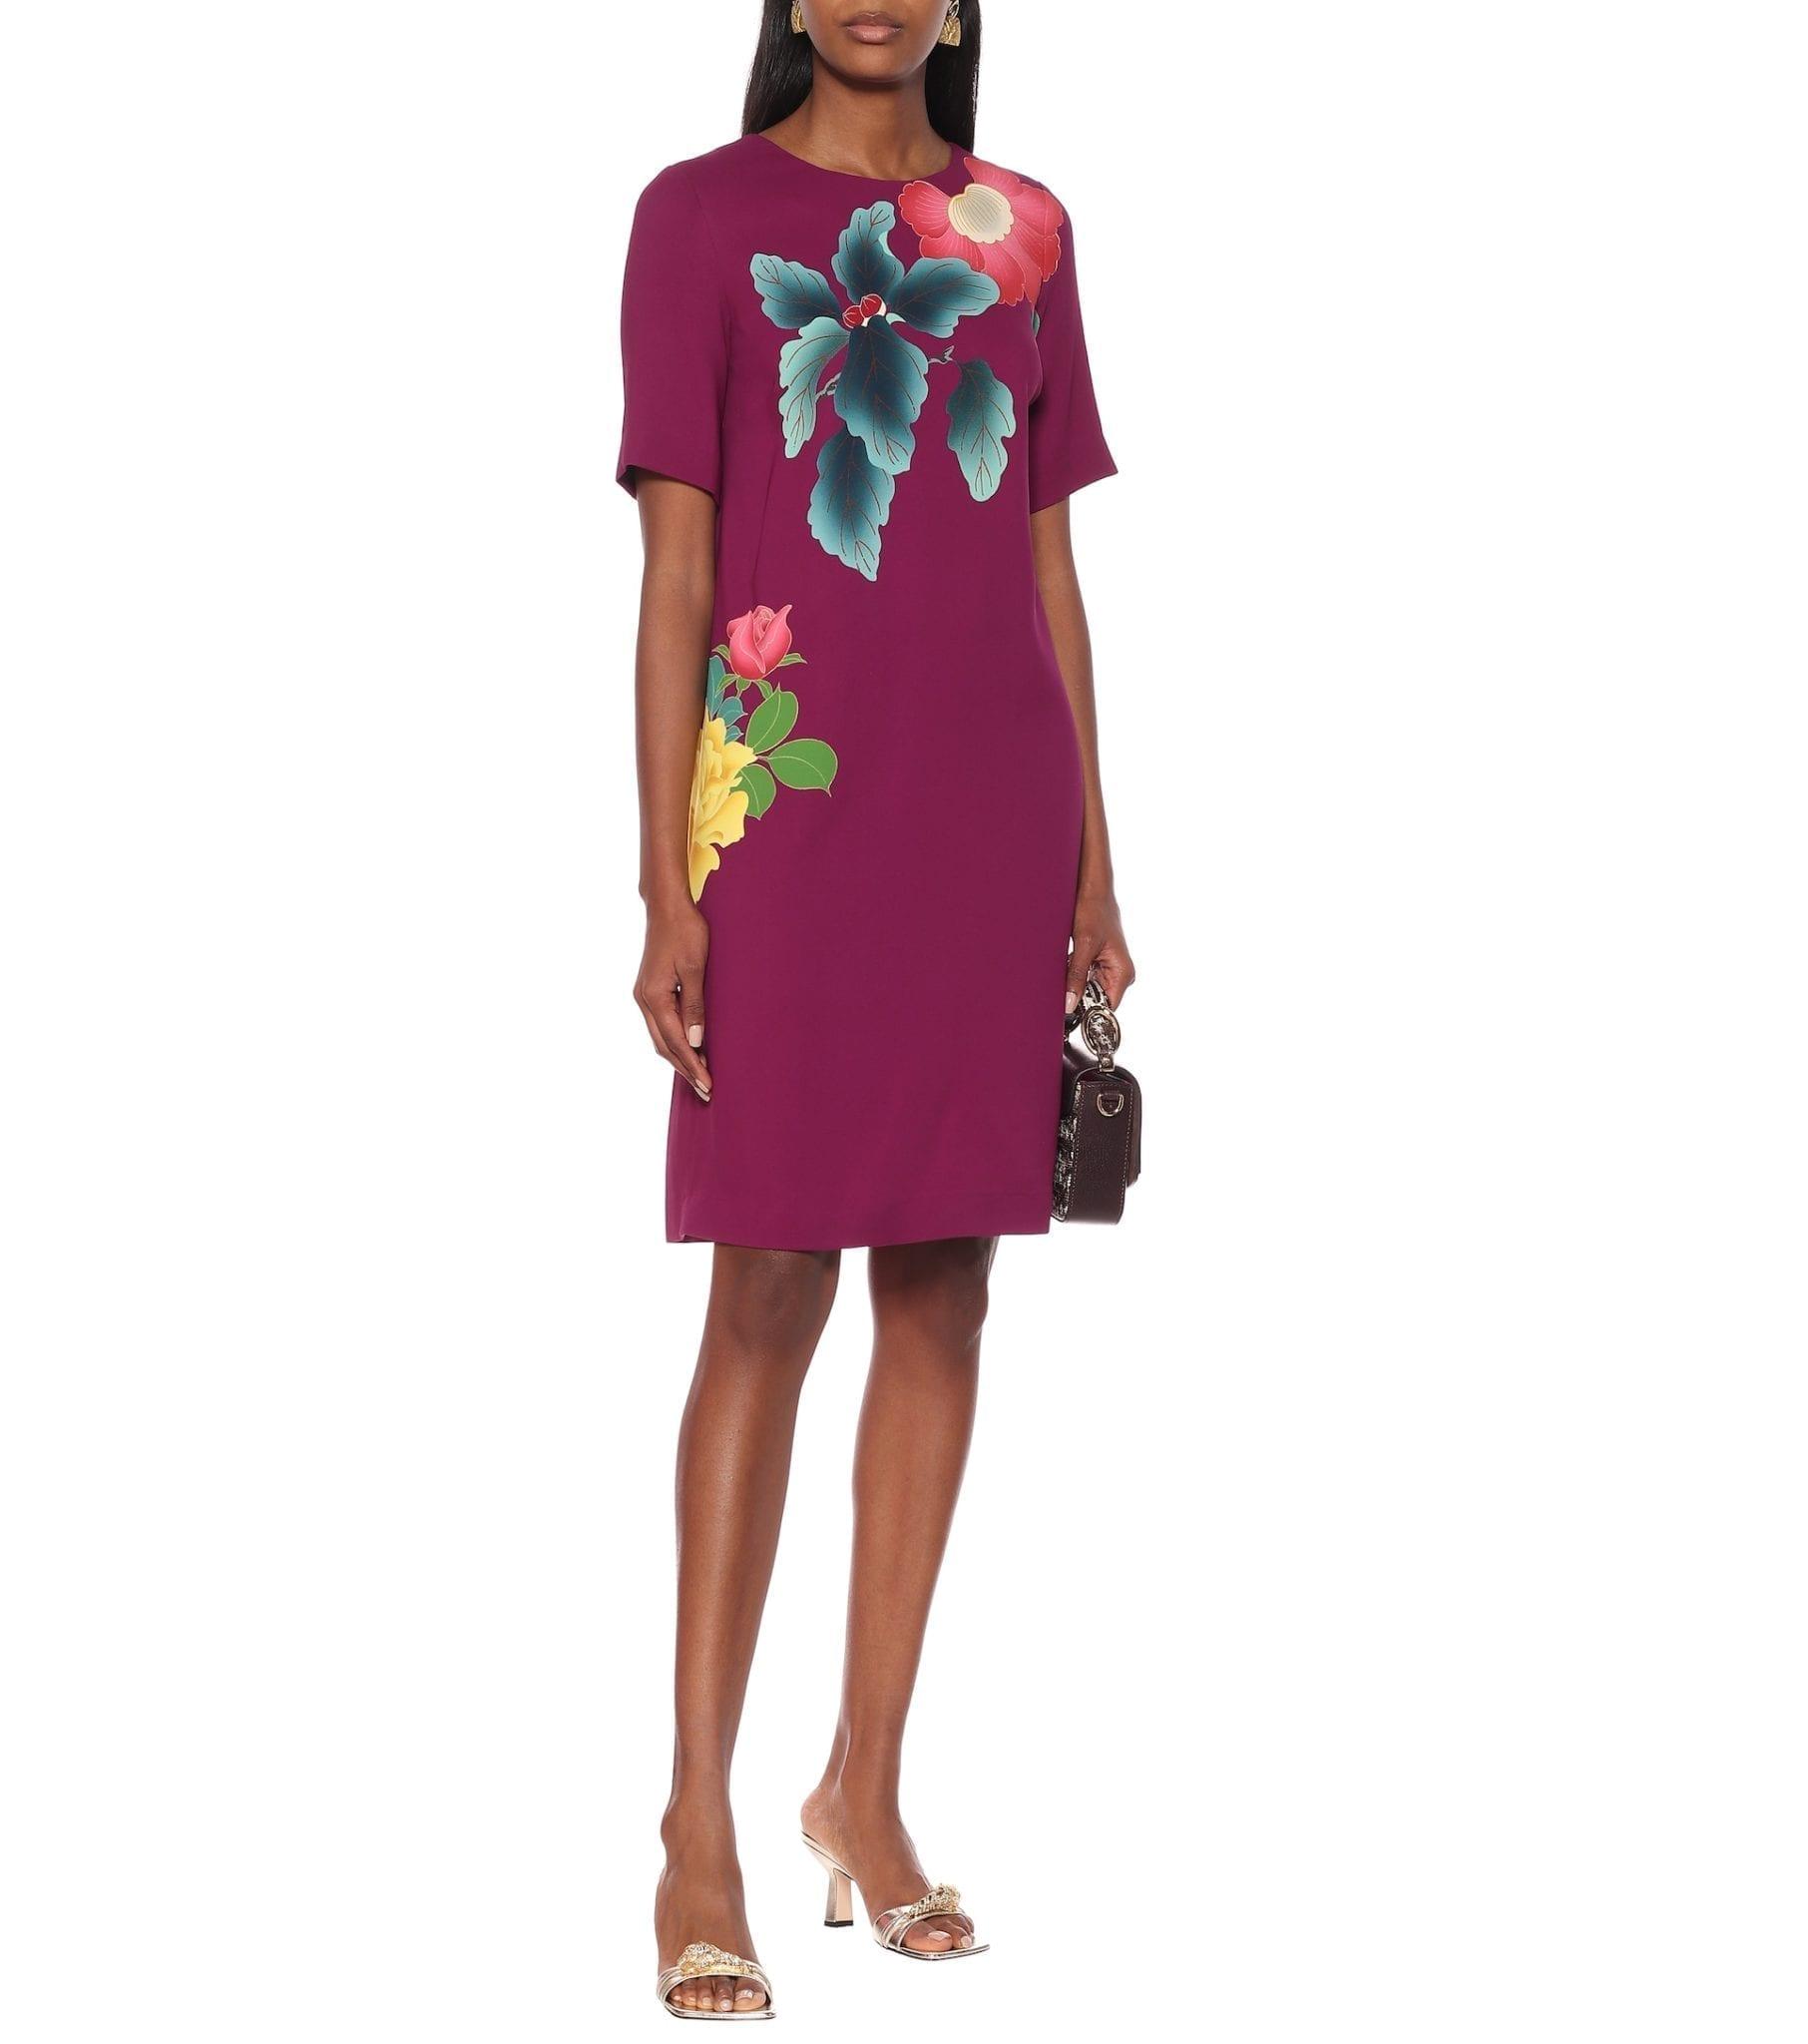 ETRO Floral Cotton-blend Crêpe Dress